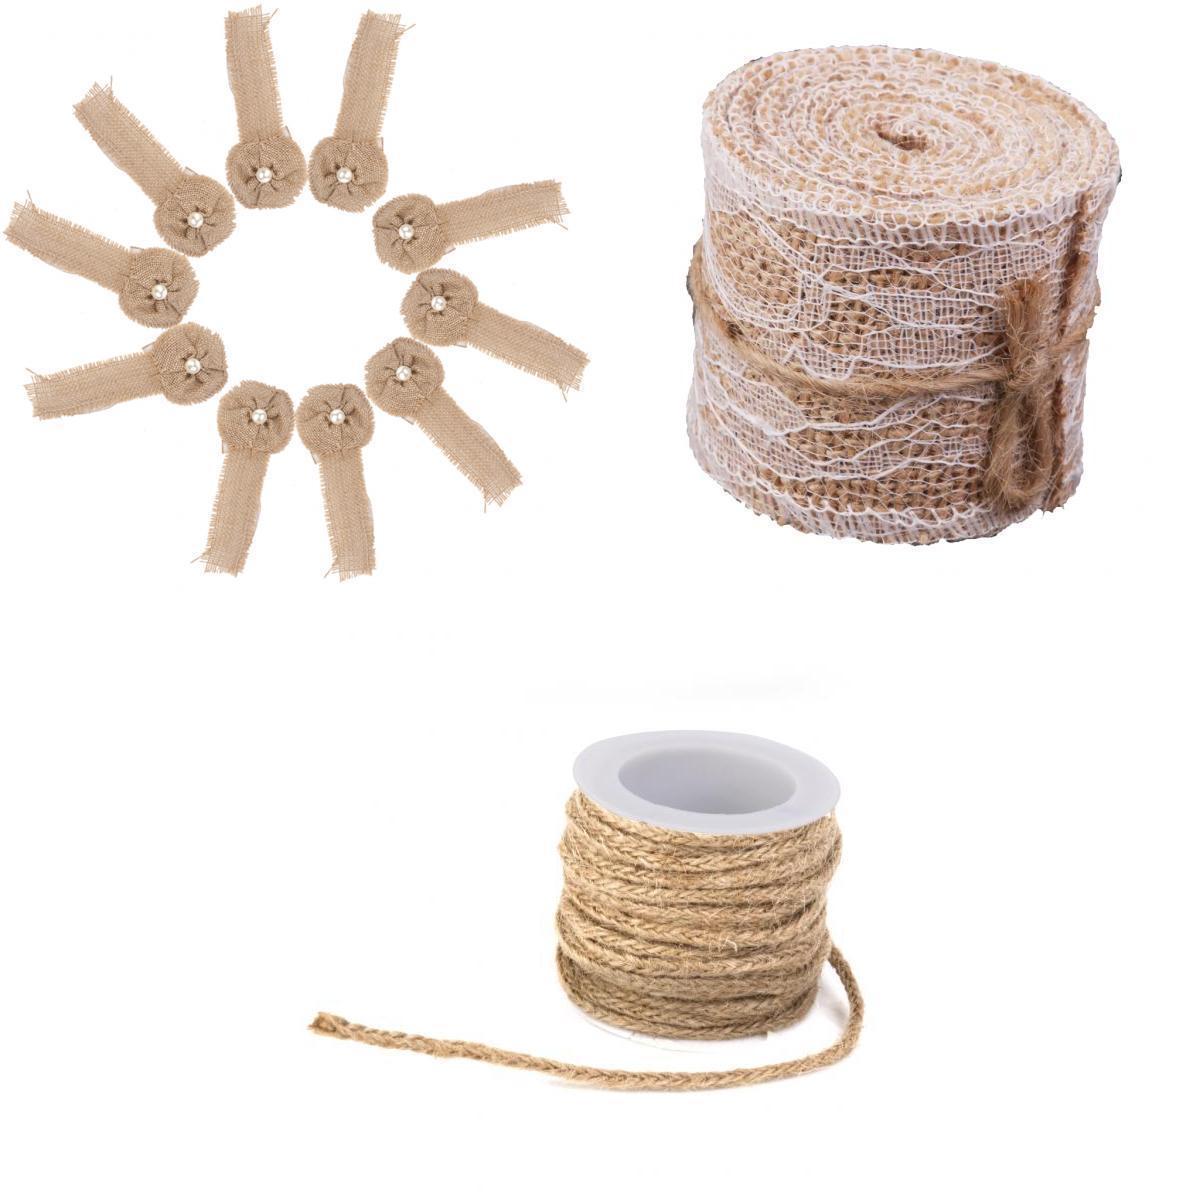 2M Hessian Burlap Ribbon Lace Trims+5M Hessian Rope+10x Hessian Burlap Flower